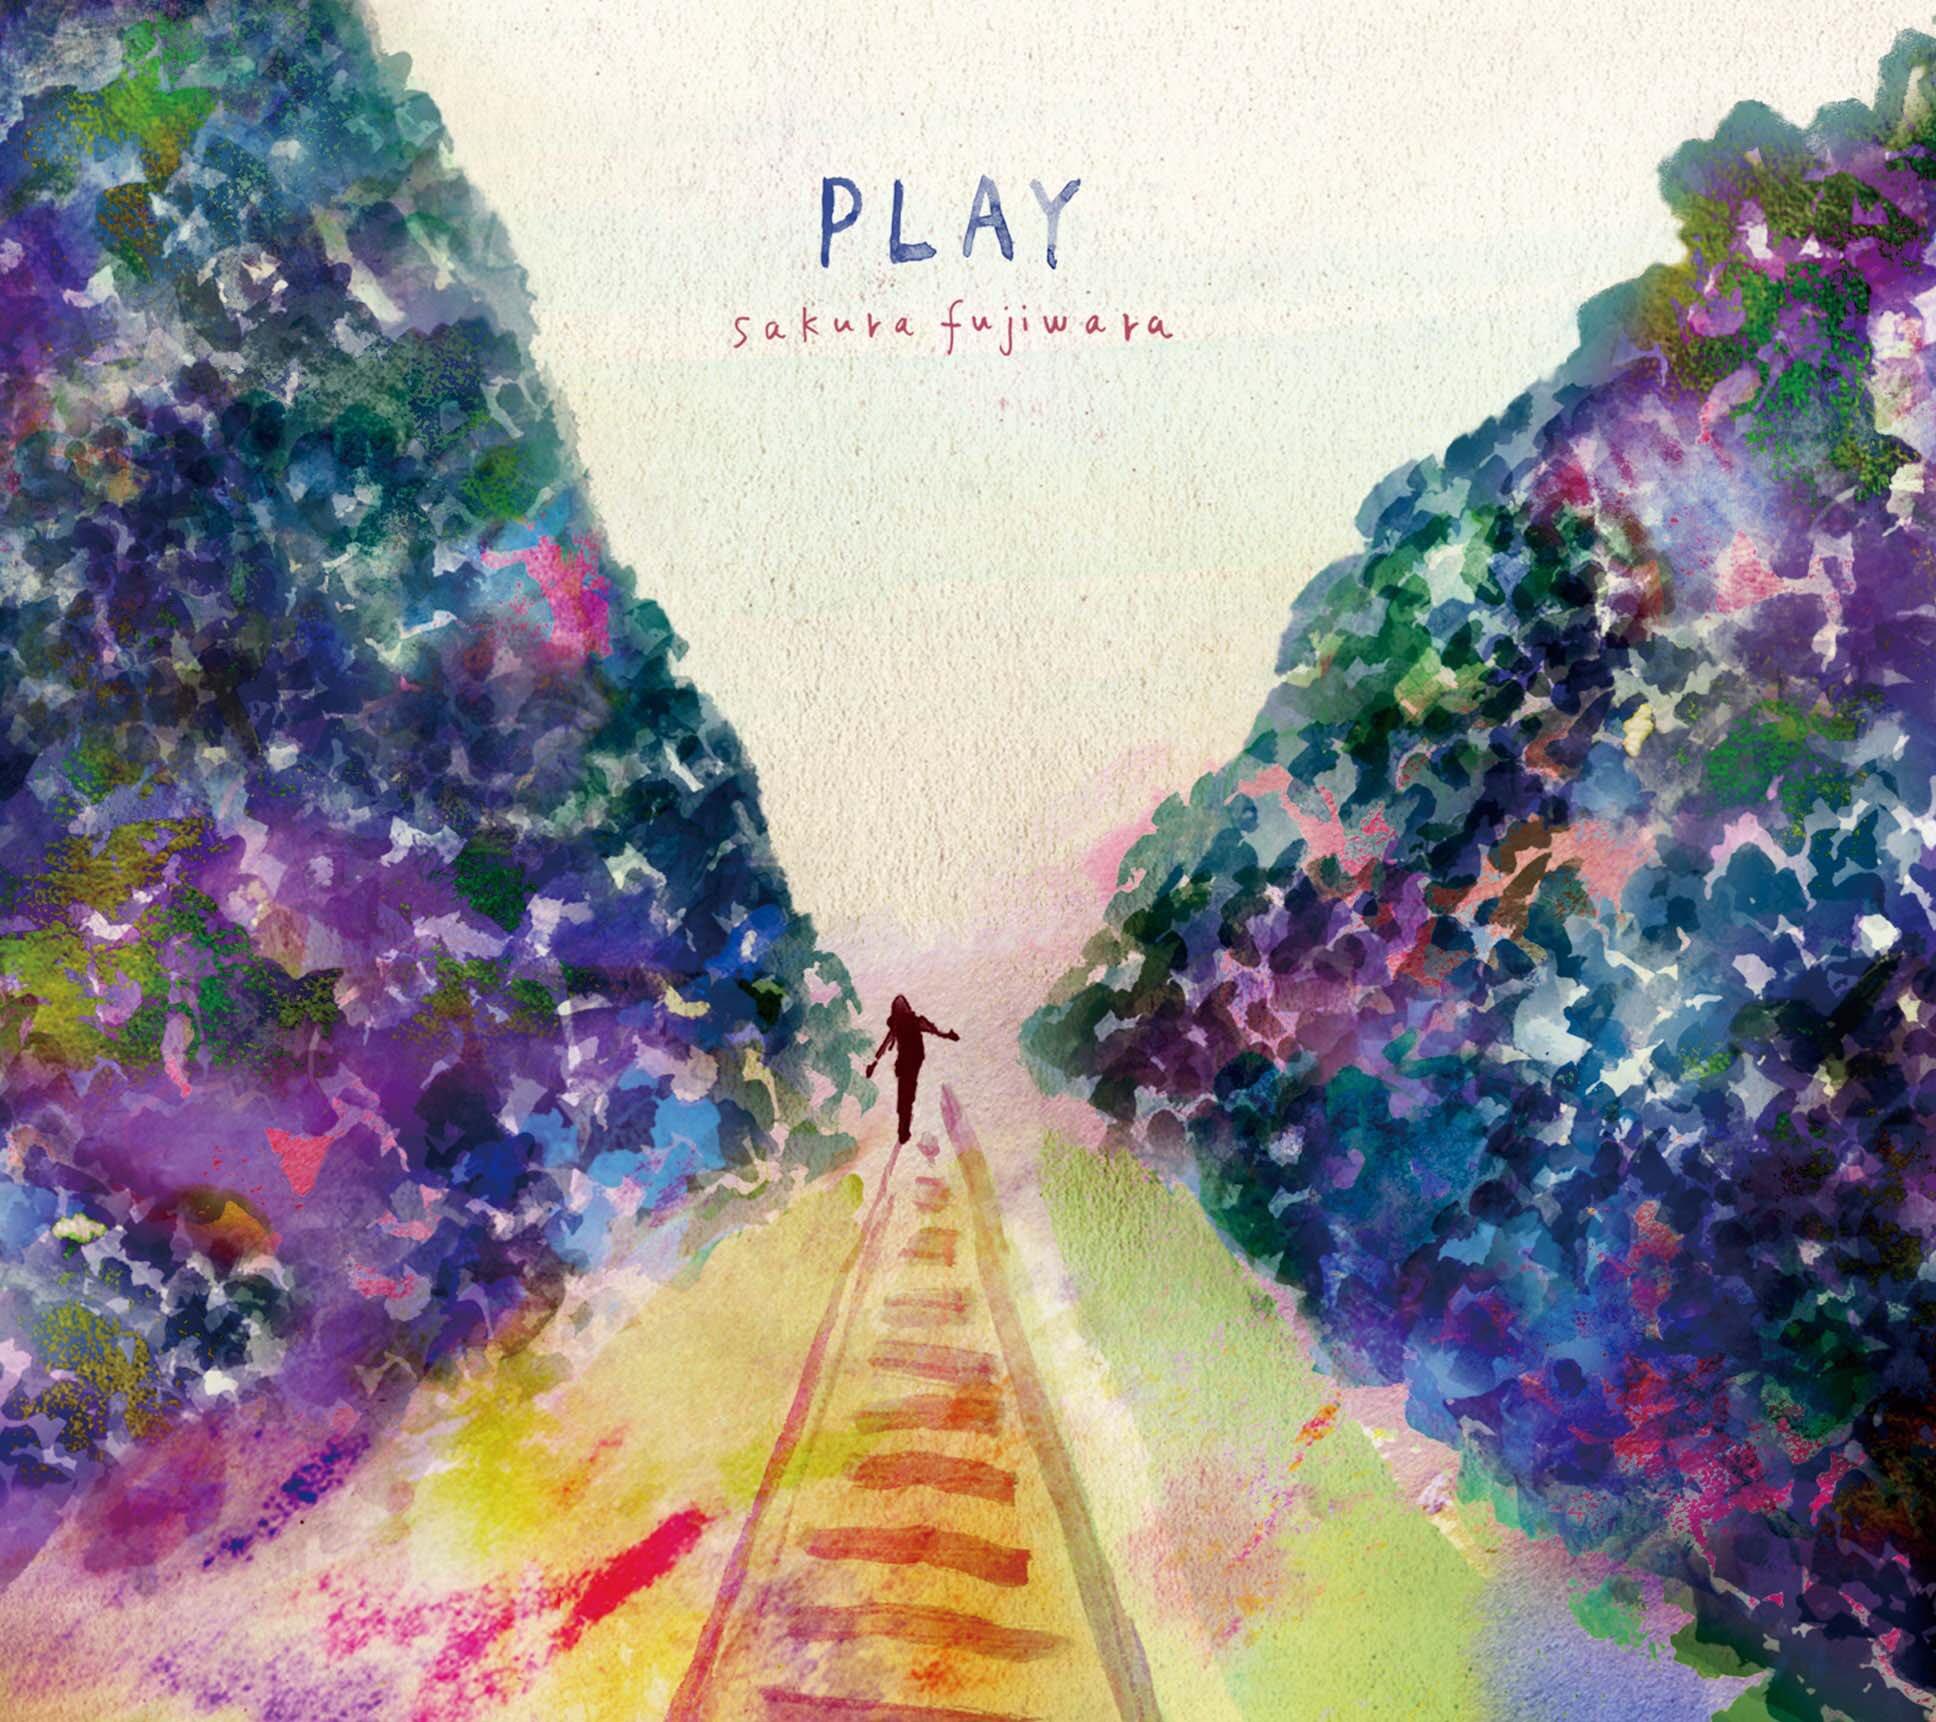 NekoPOP-Fujiwara Sakura-Play-best-cover